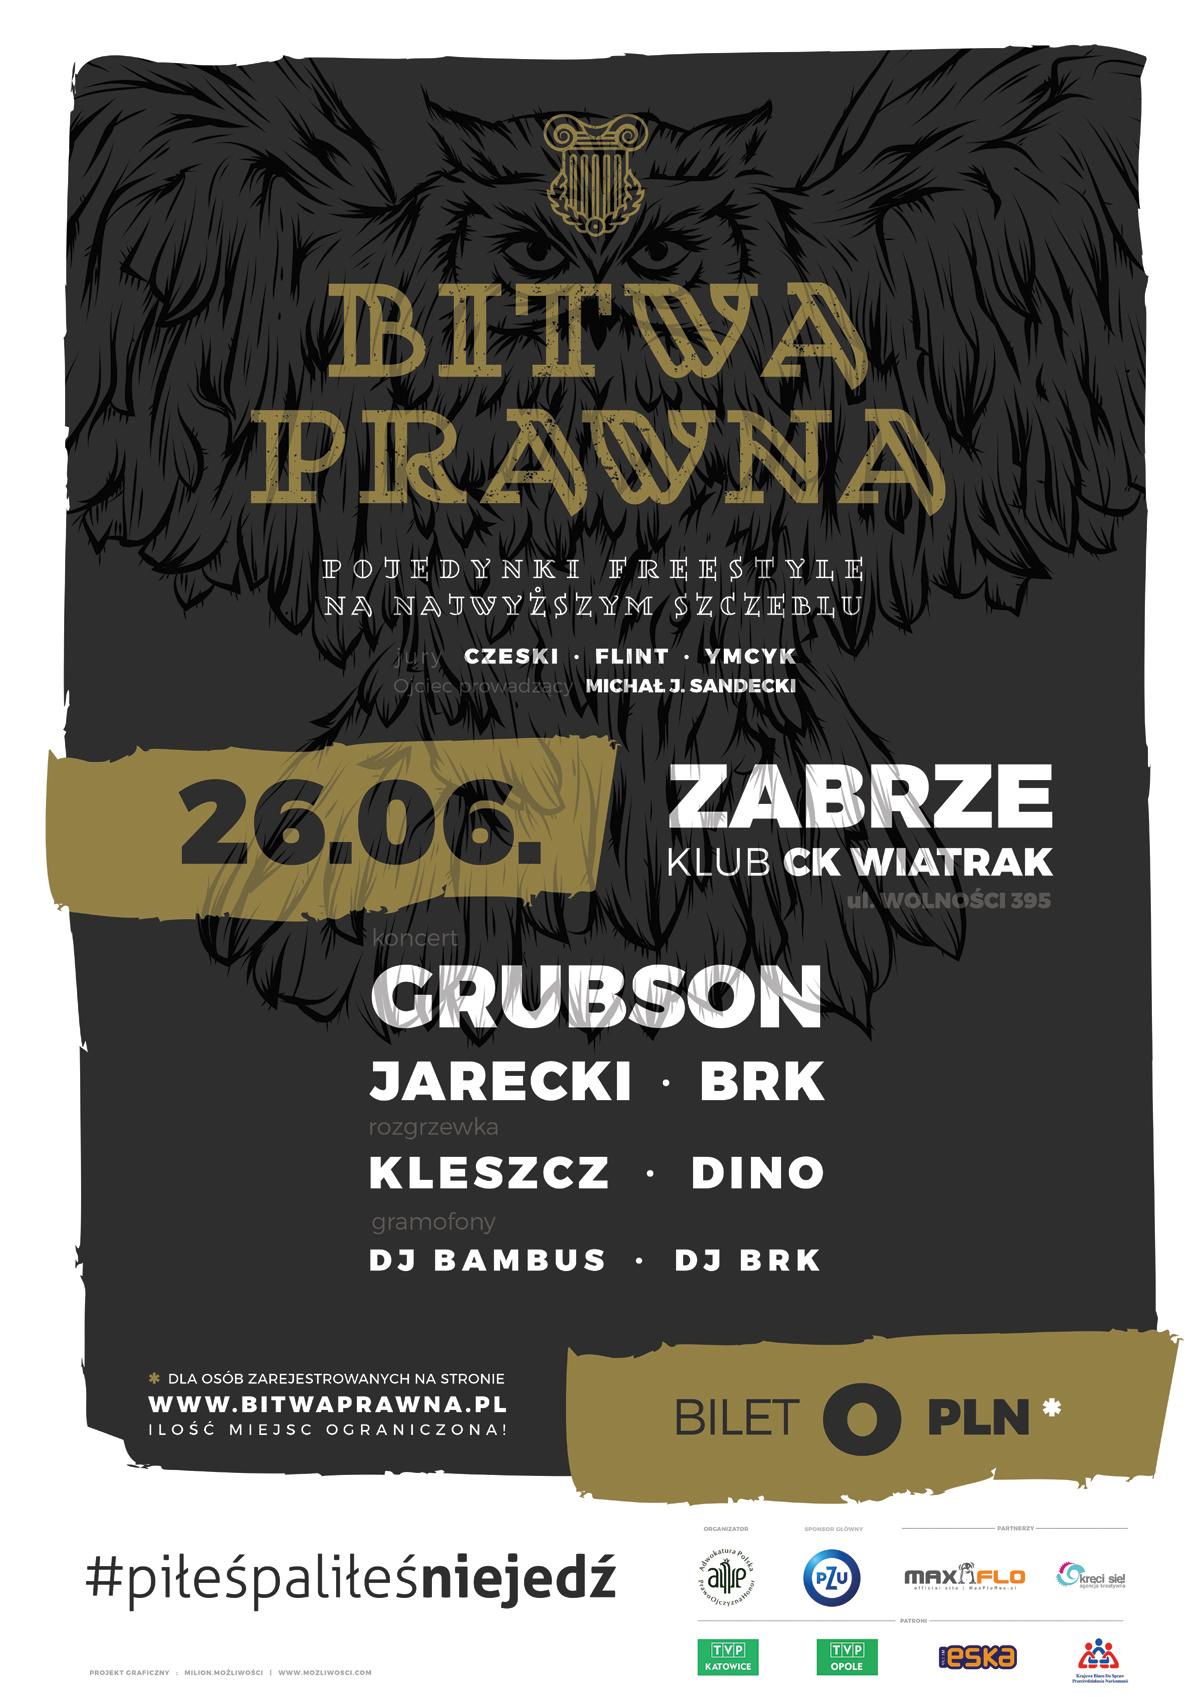 BitwaPrawna_plakat7 (1)